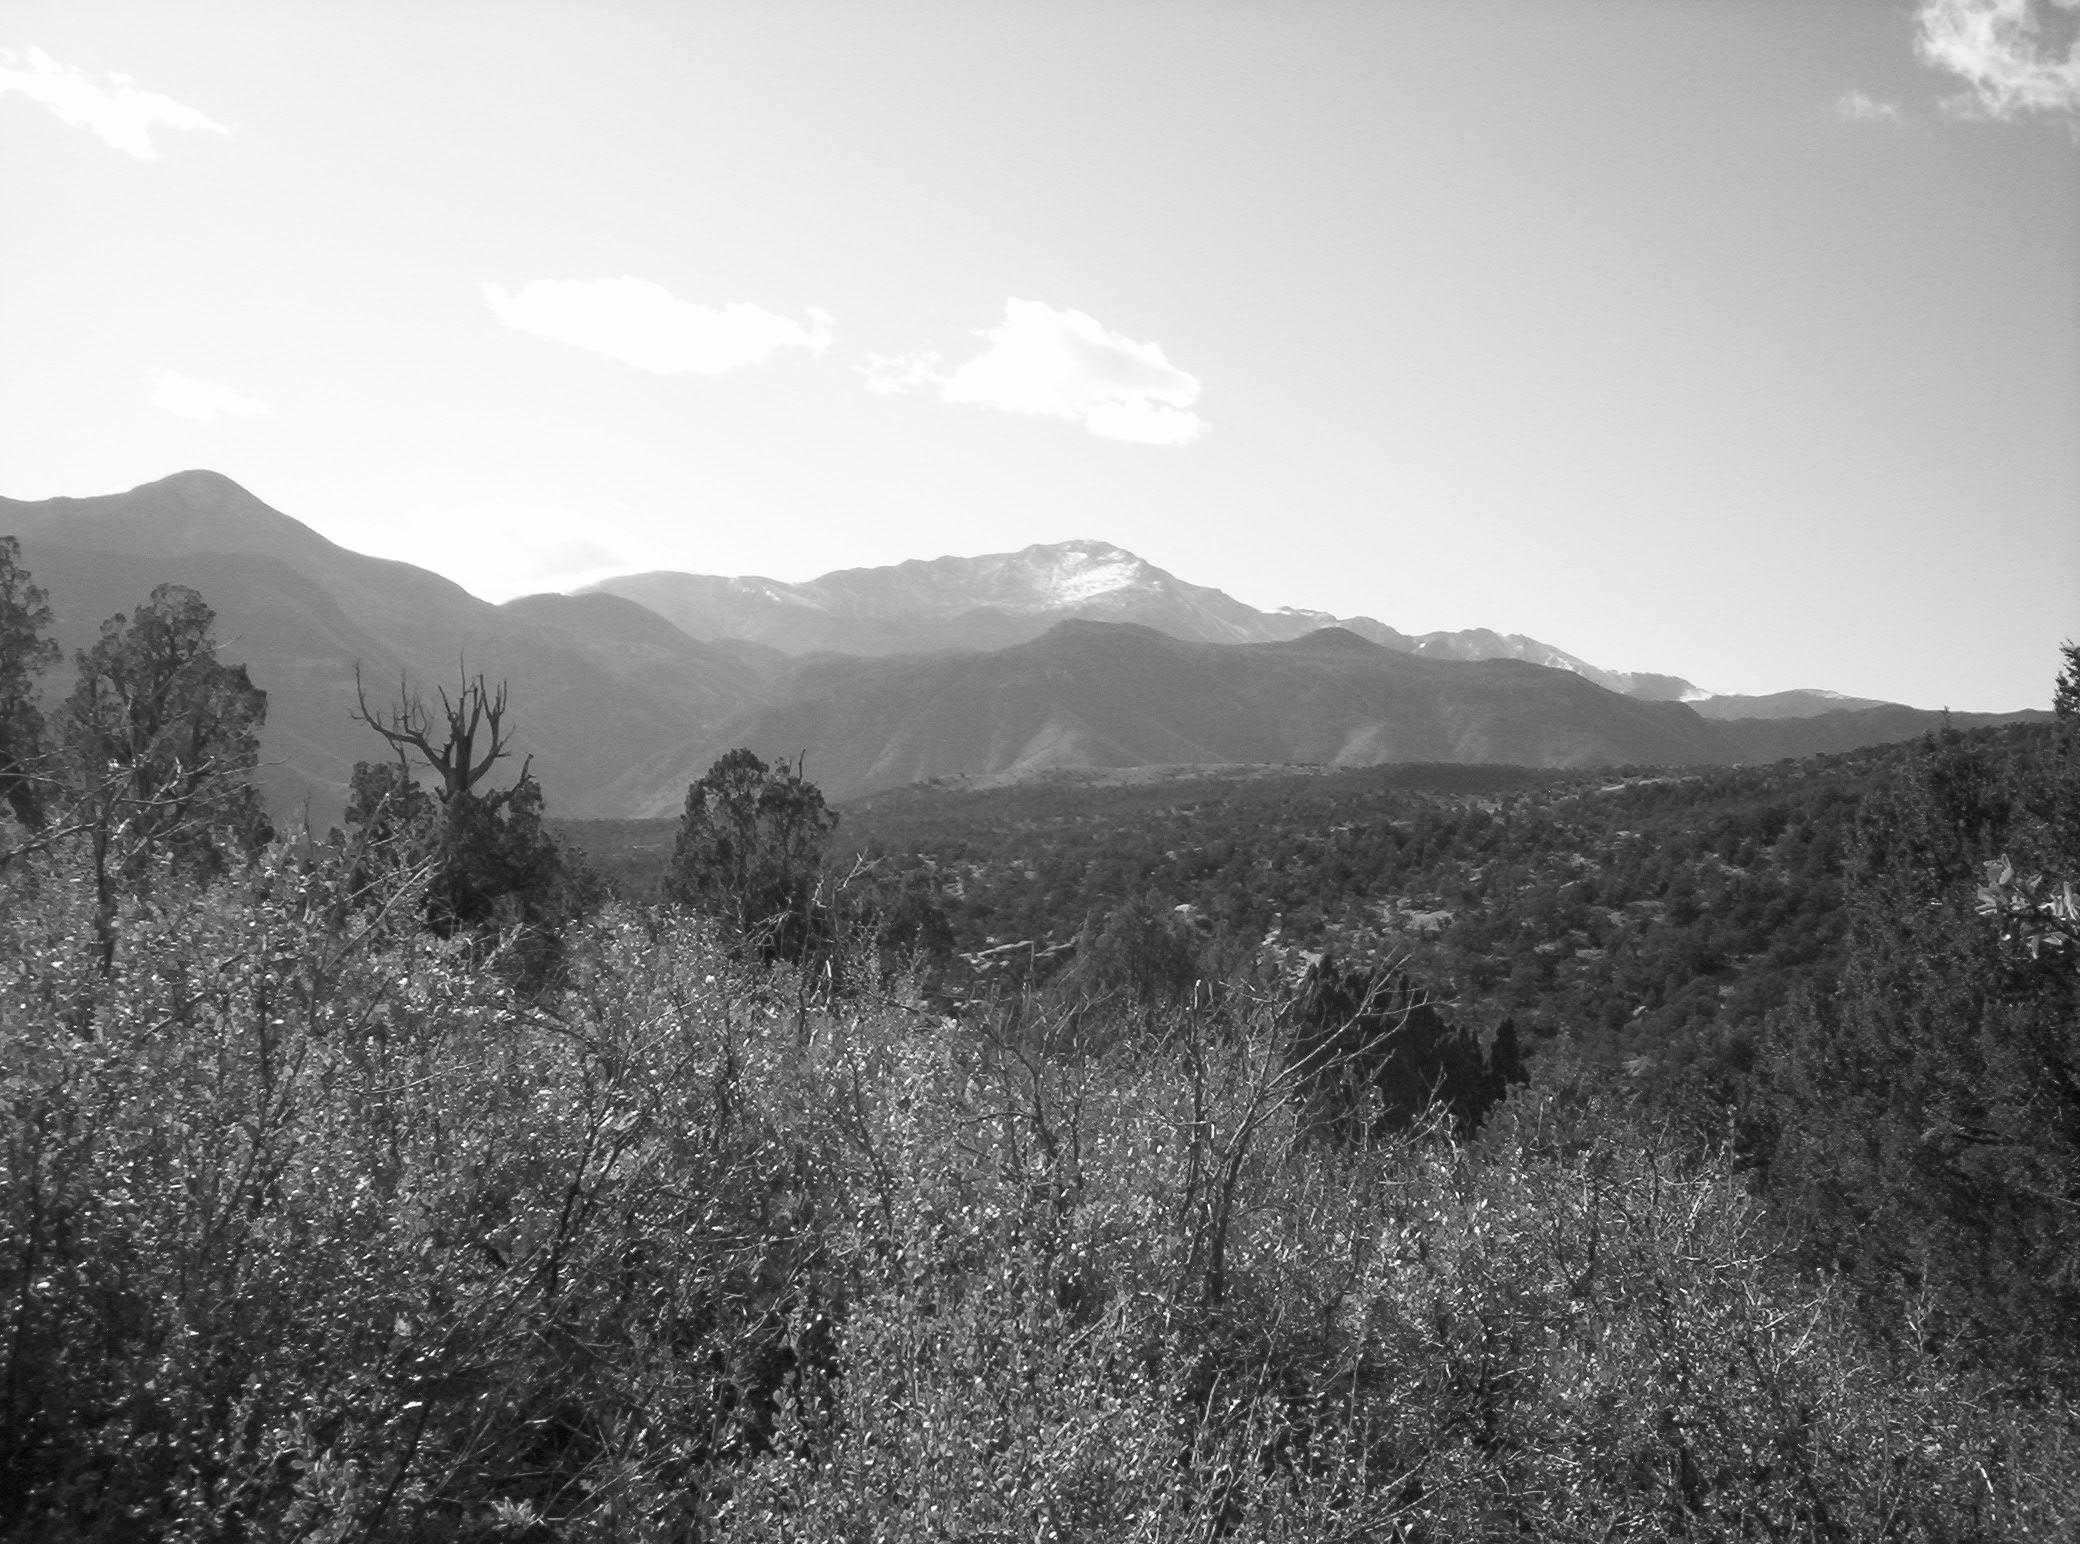 Buena Vista Copyright © 2008 David M. Bandler, All Rights Reserved.